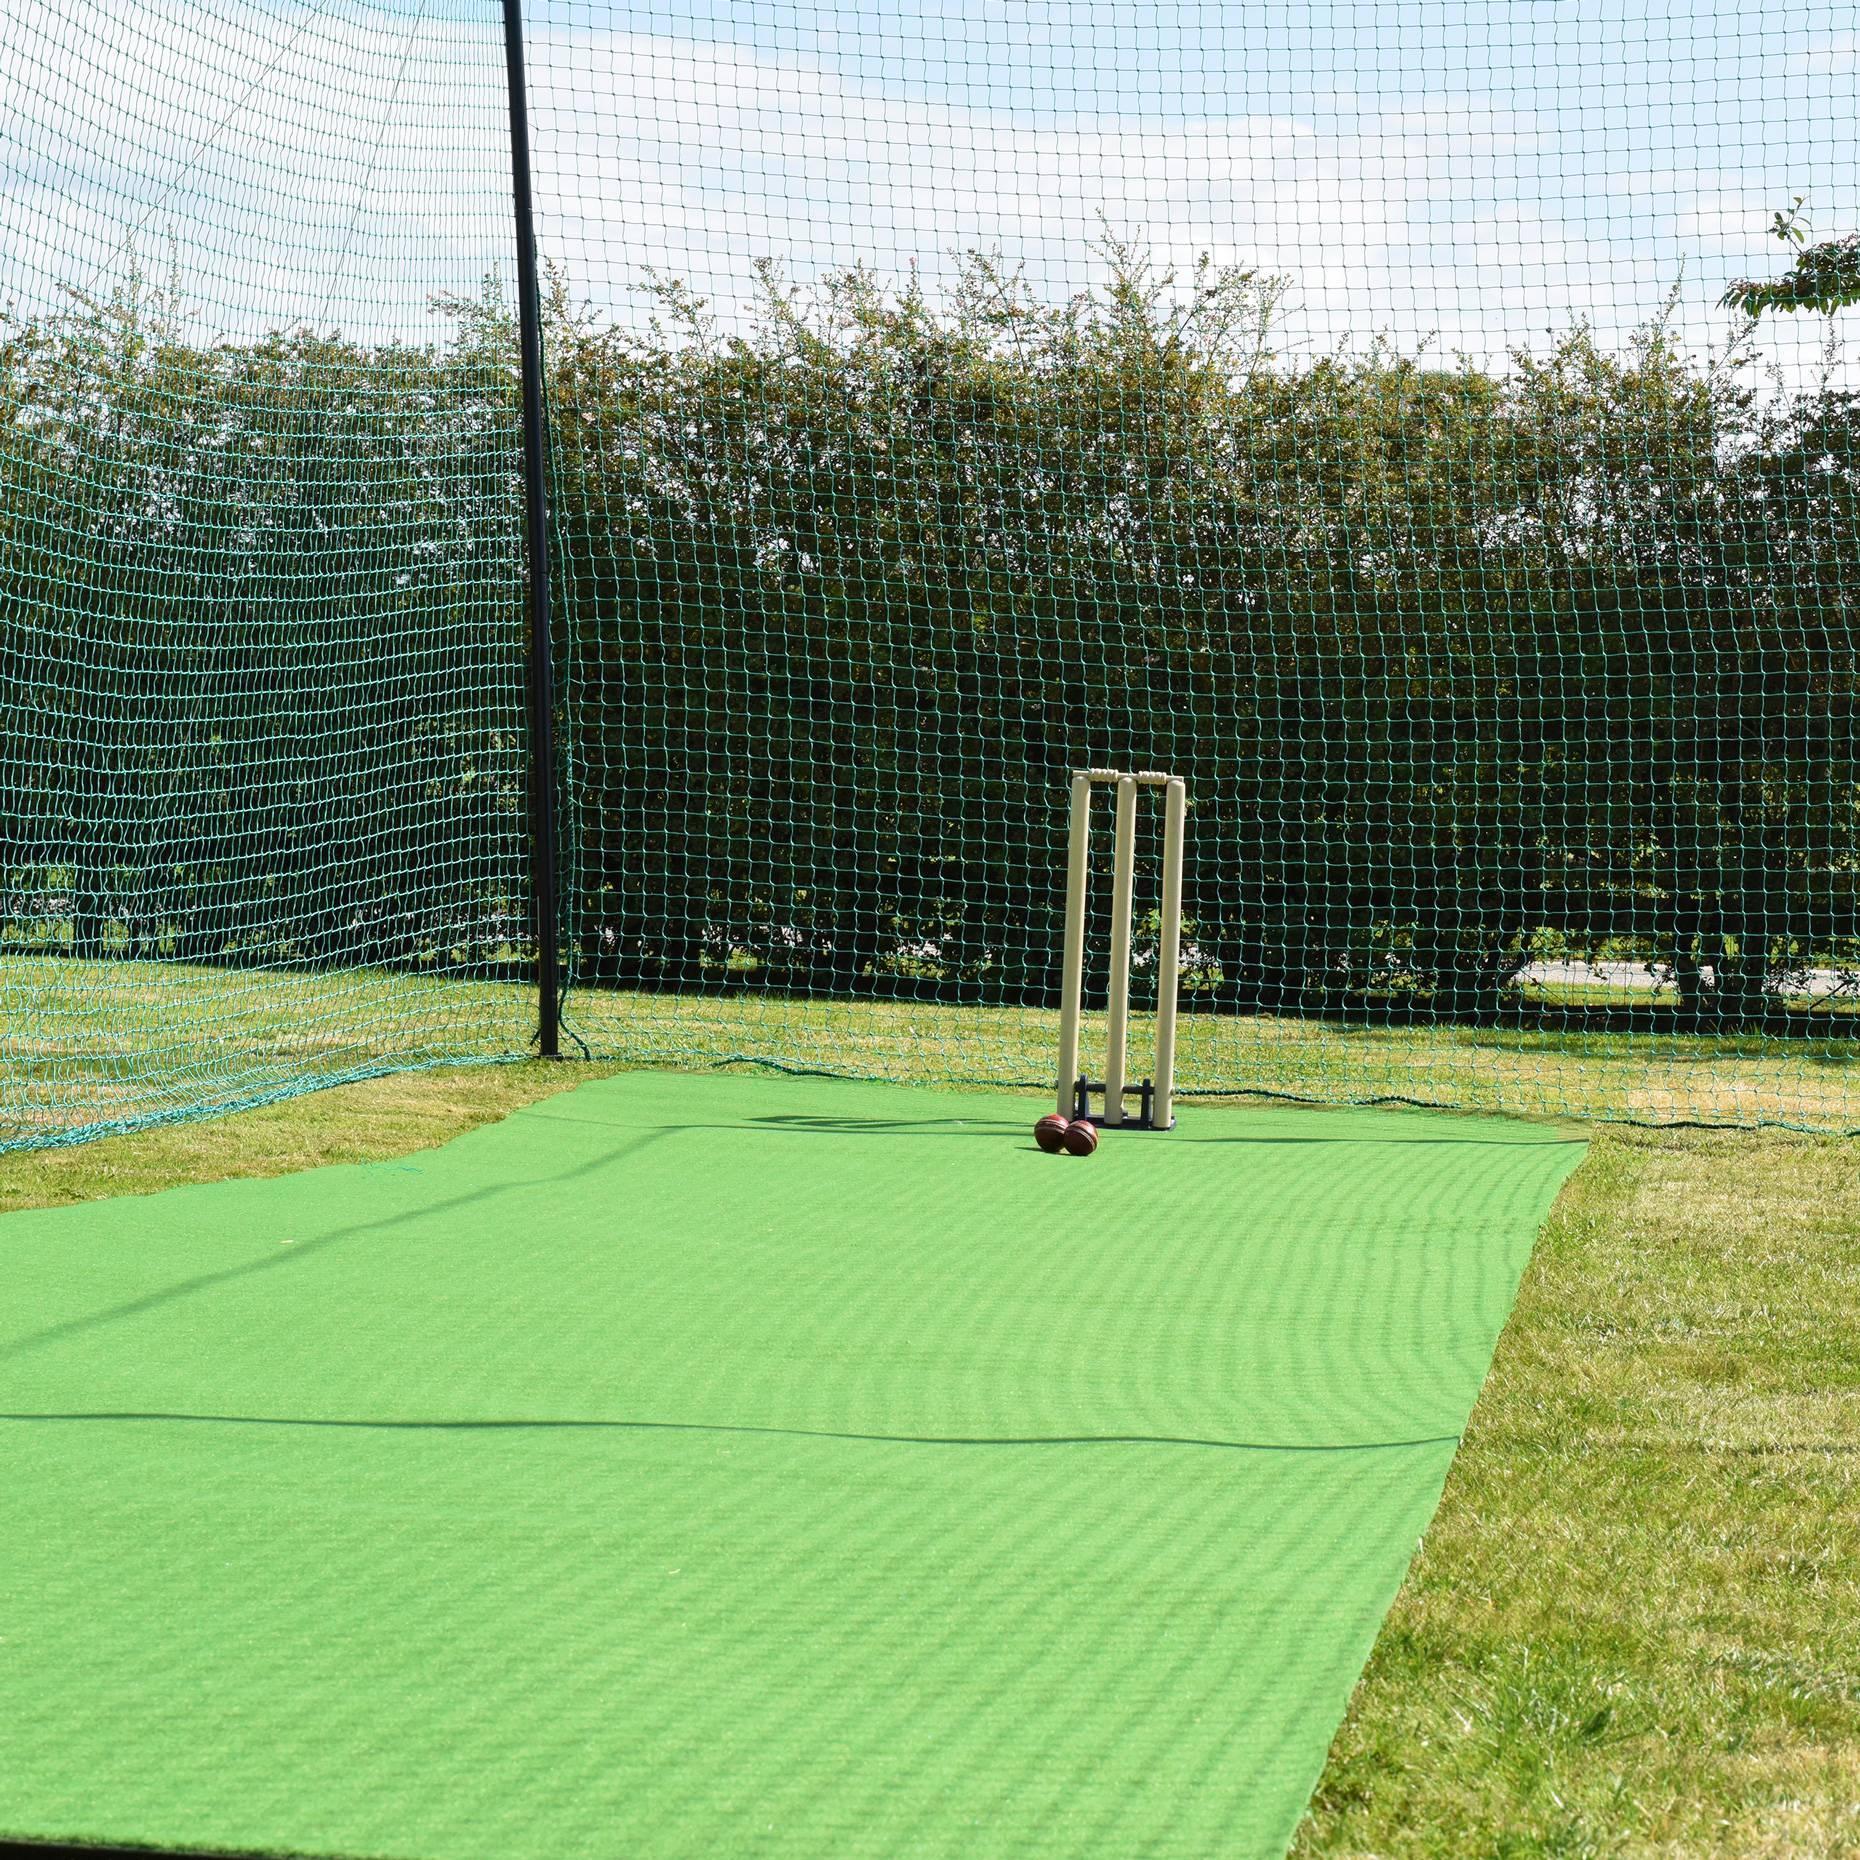 Roll Down (Lightweight) Cricket Matting - 2m Wide (Indoor/Outdoor)